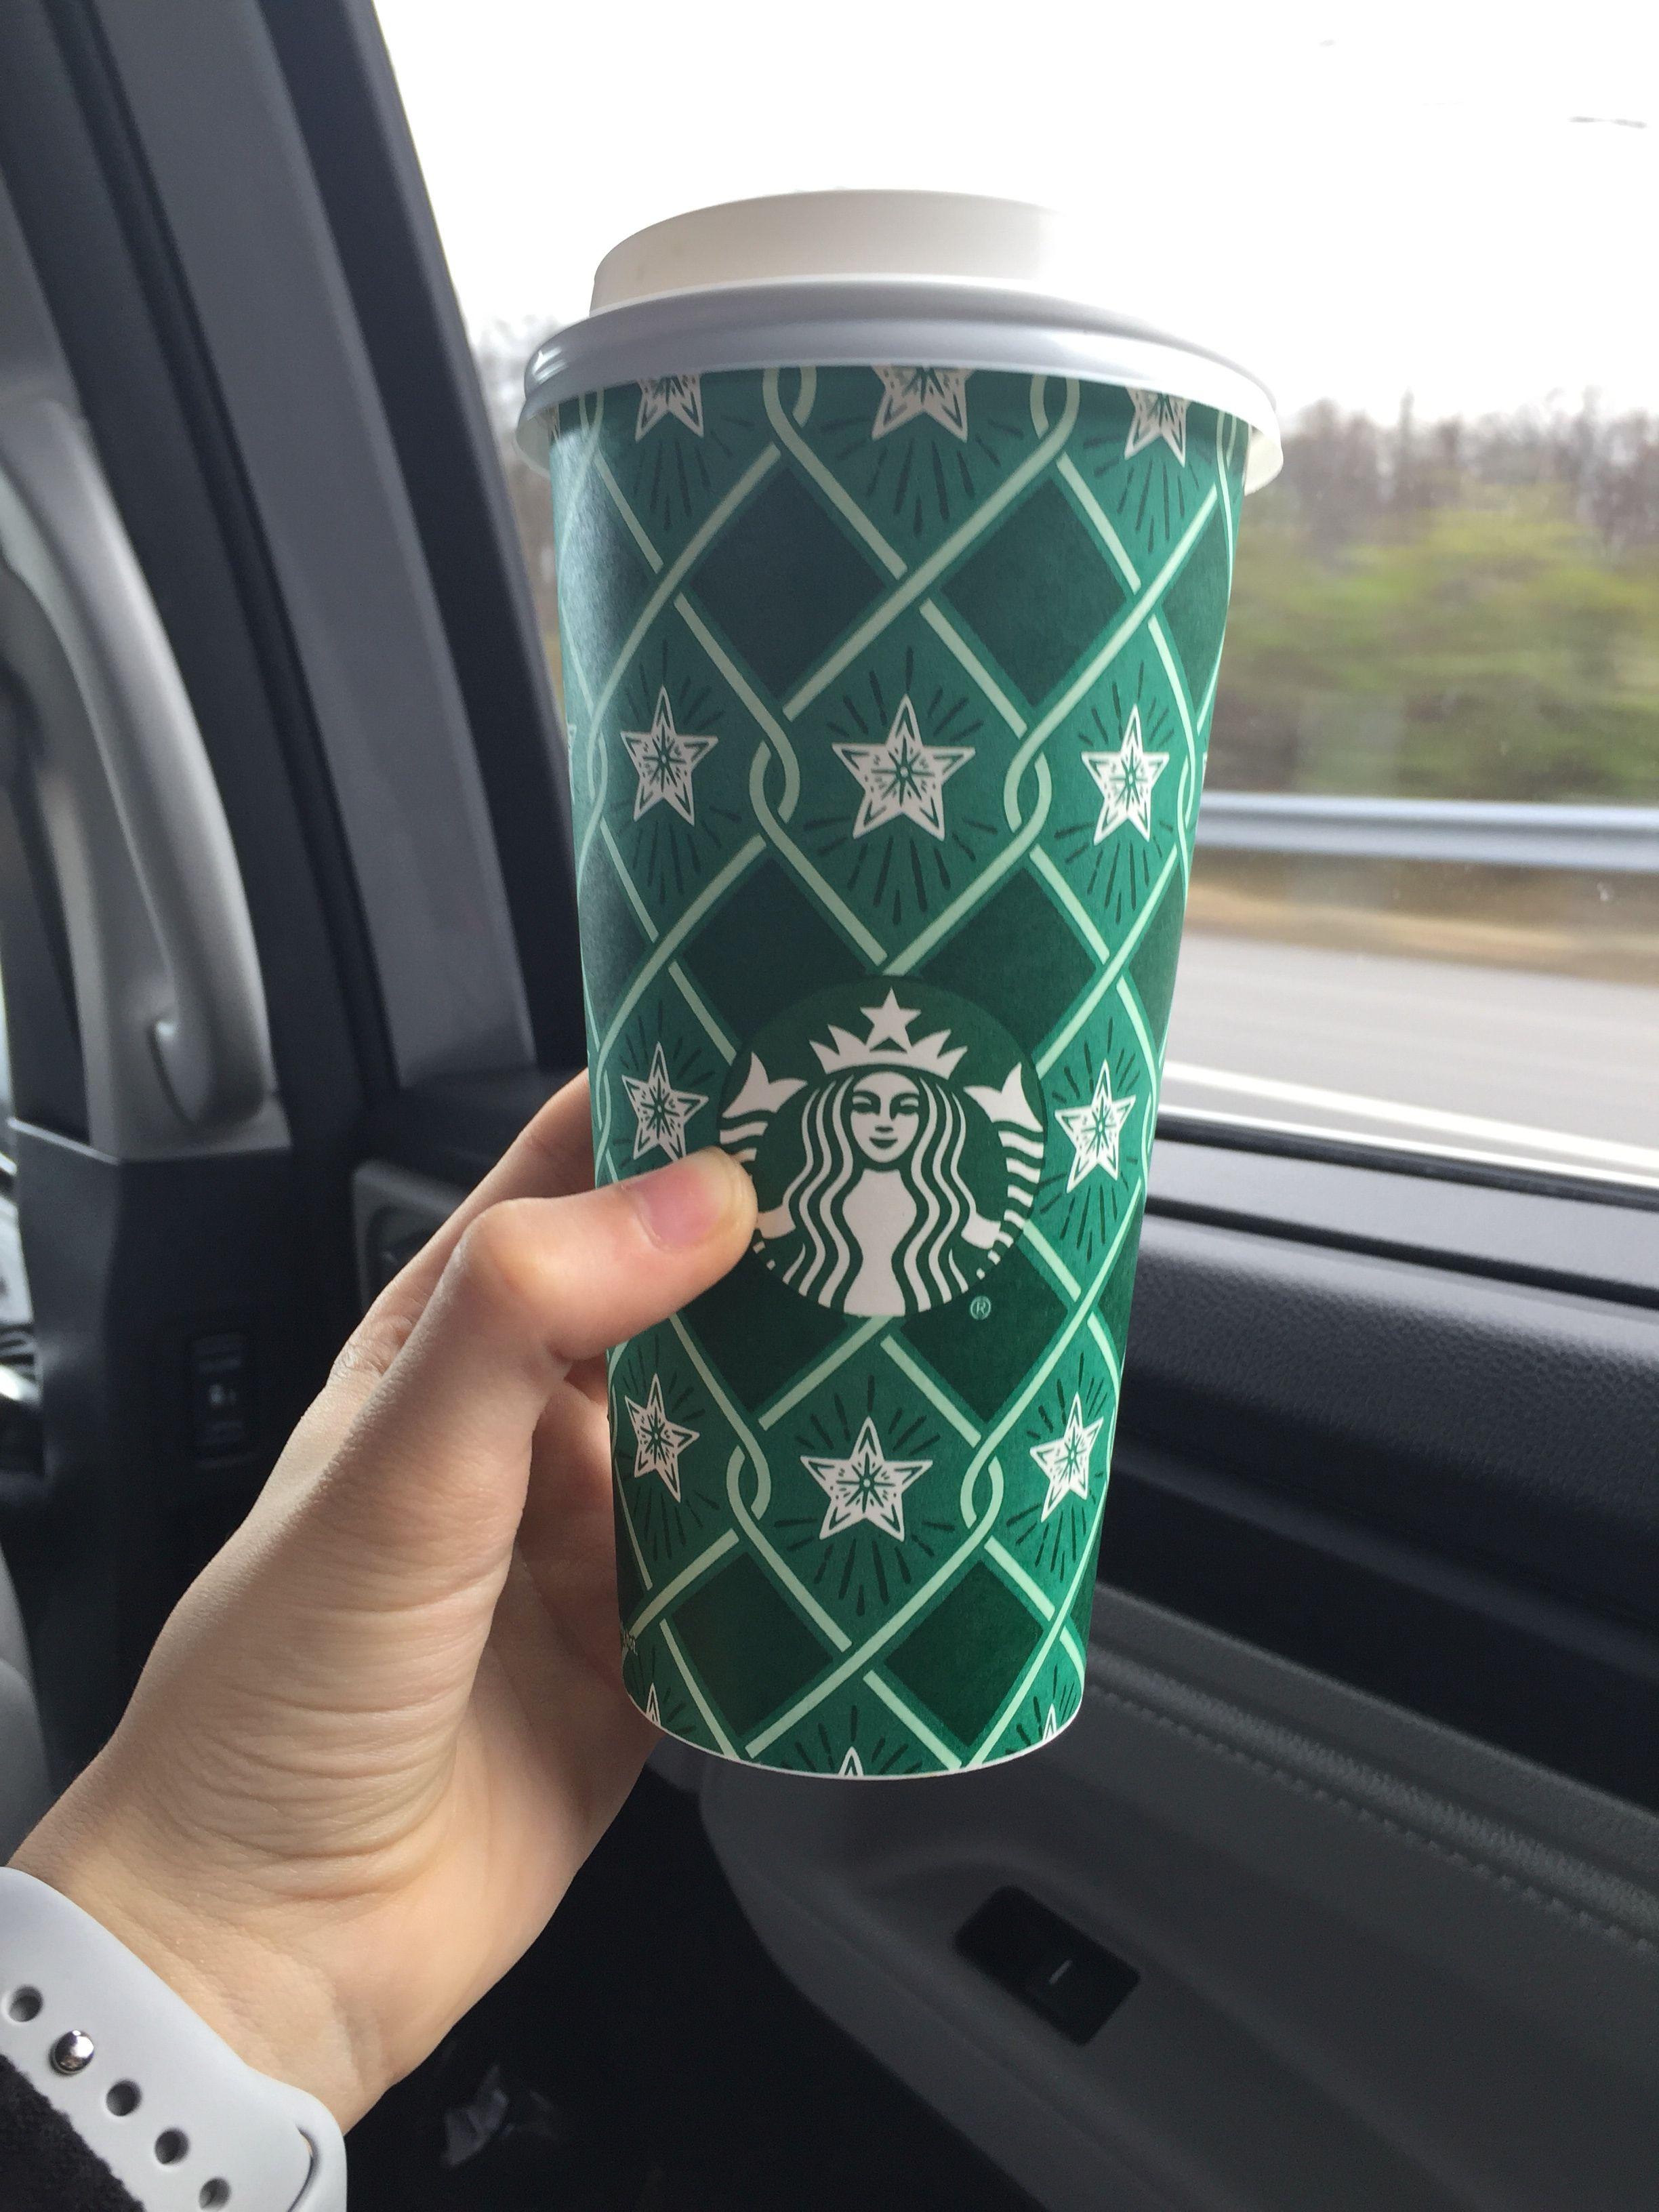 holiday green starbucks drinks cups winter